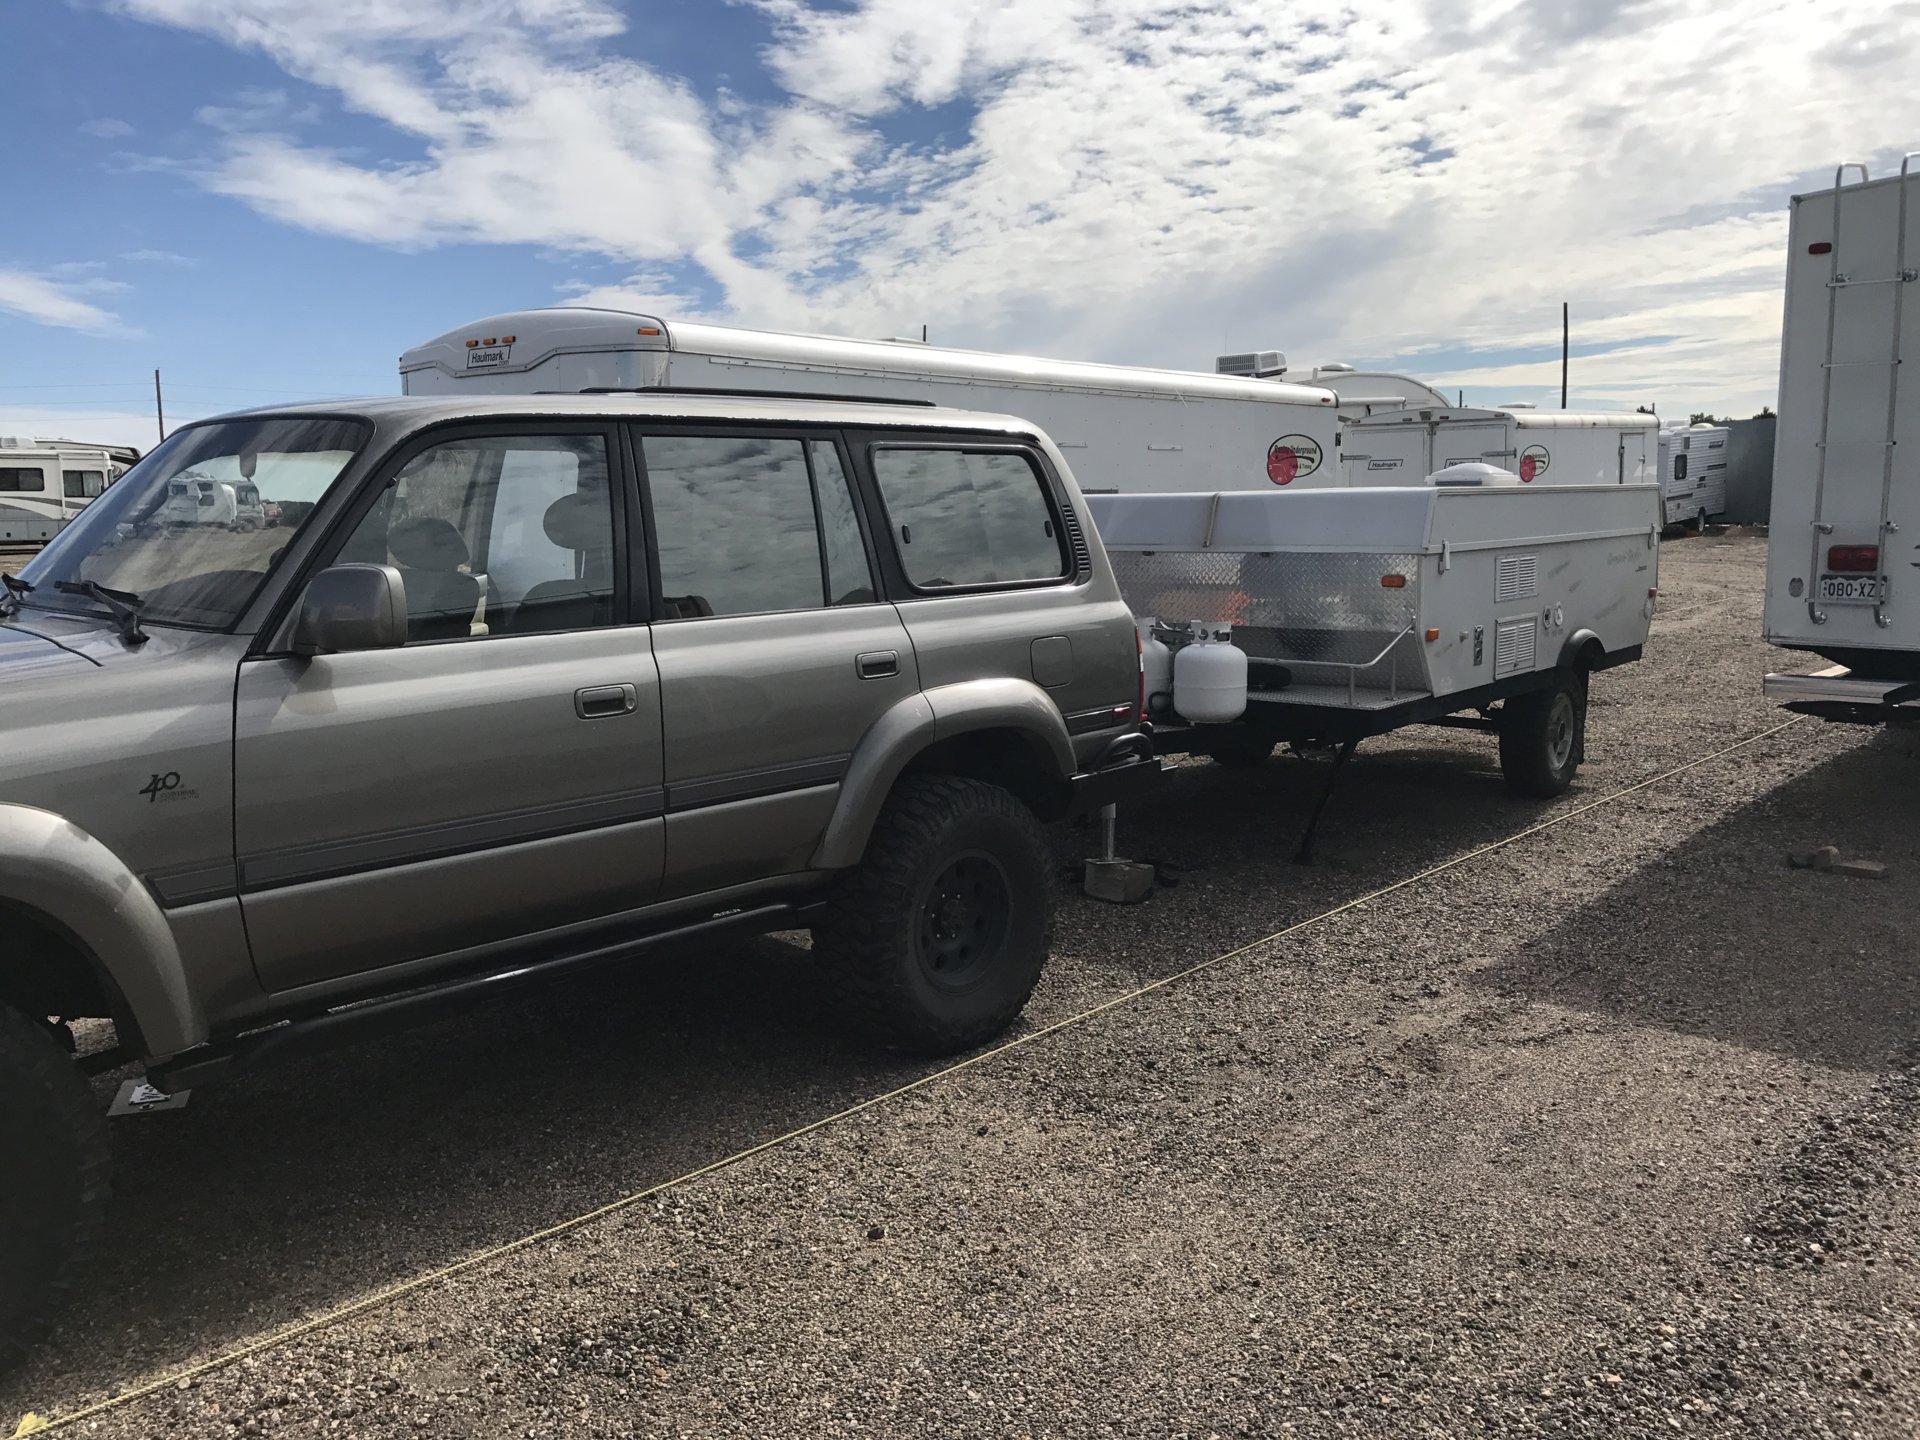 For Sale - Jayco Baja Off Road Pop up Camper | IH8MUD Forum